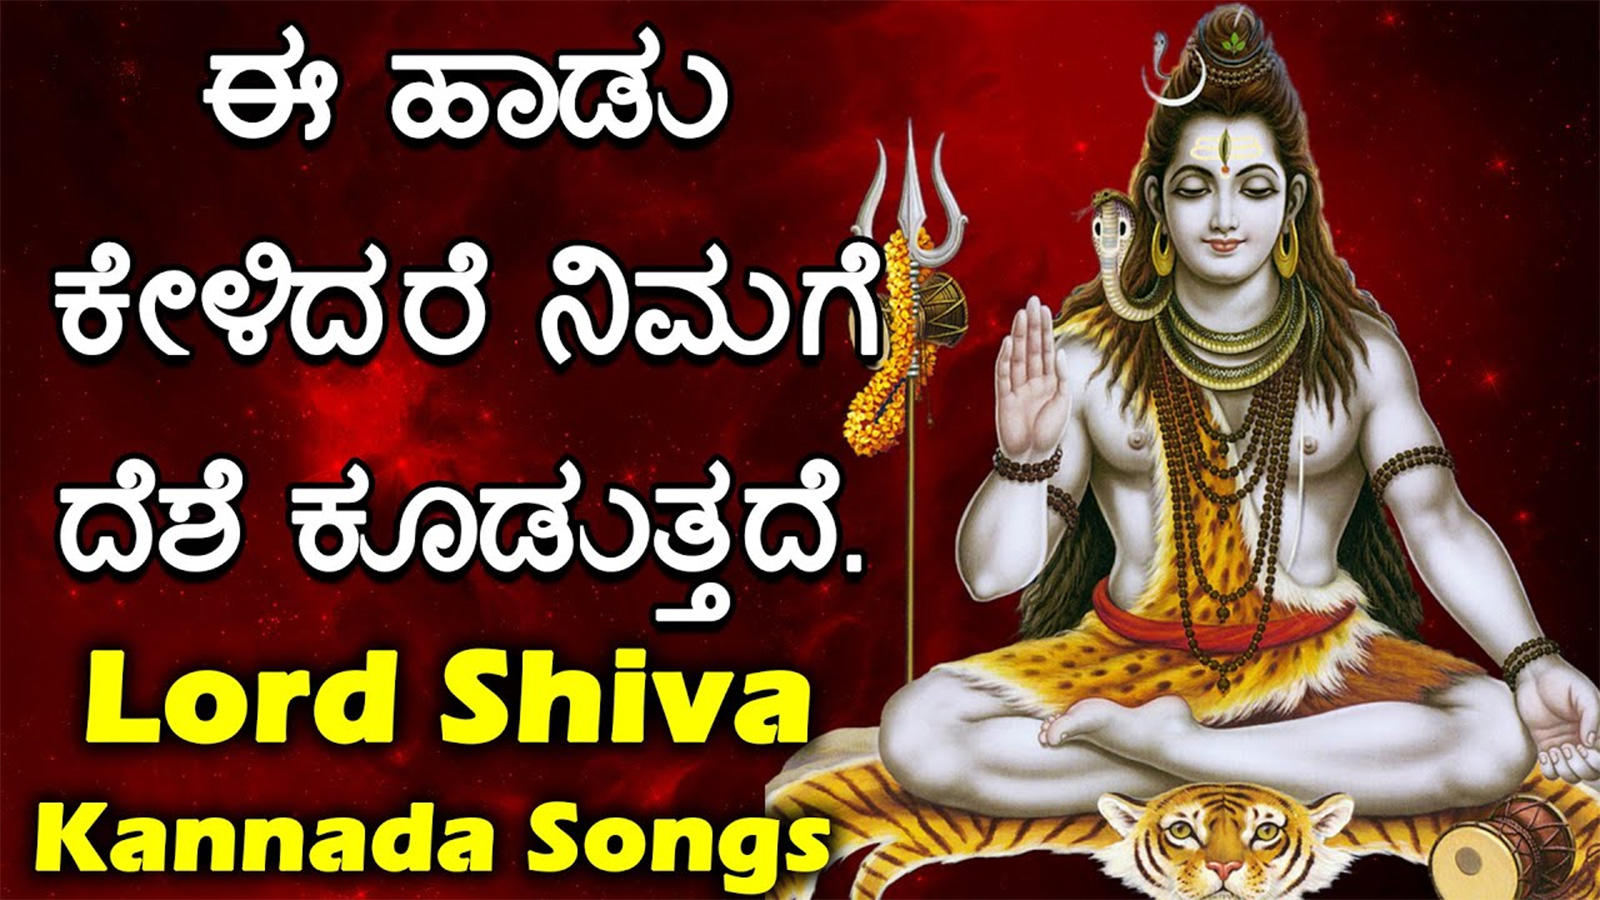 Lord Shiva Kannada Bhakti Songs Listen To Popular Kannada Devotional Video Song Swamy Beerappana Noda Jukebox Popular Kannada Devotional Songs Kannada Bhakti Songs Devotional Songs Bhajans And Pooja Aarti Songs